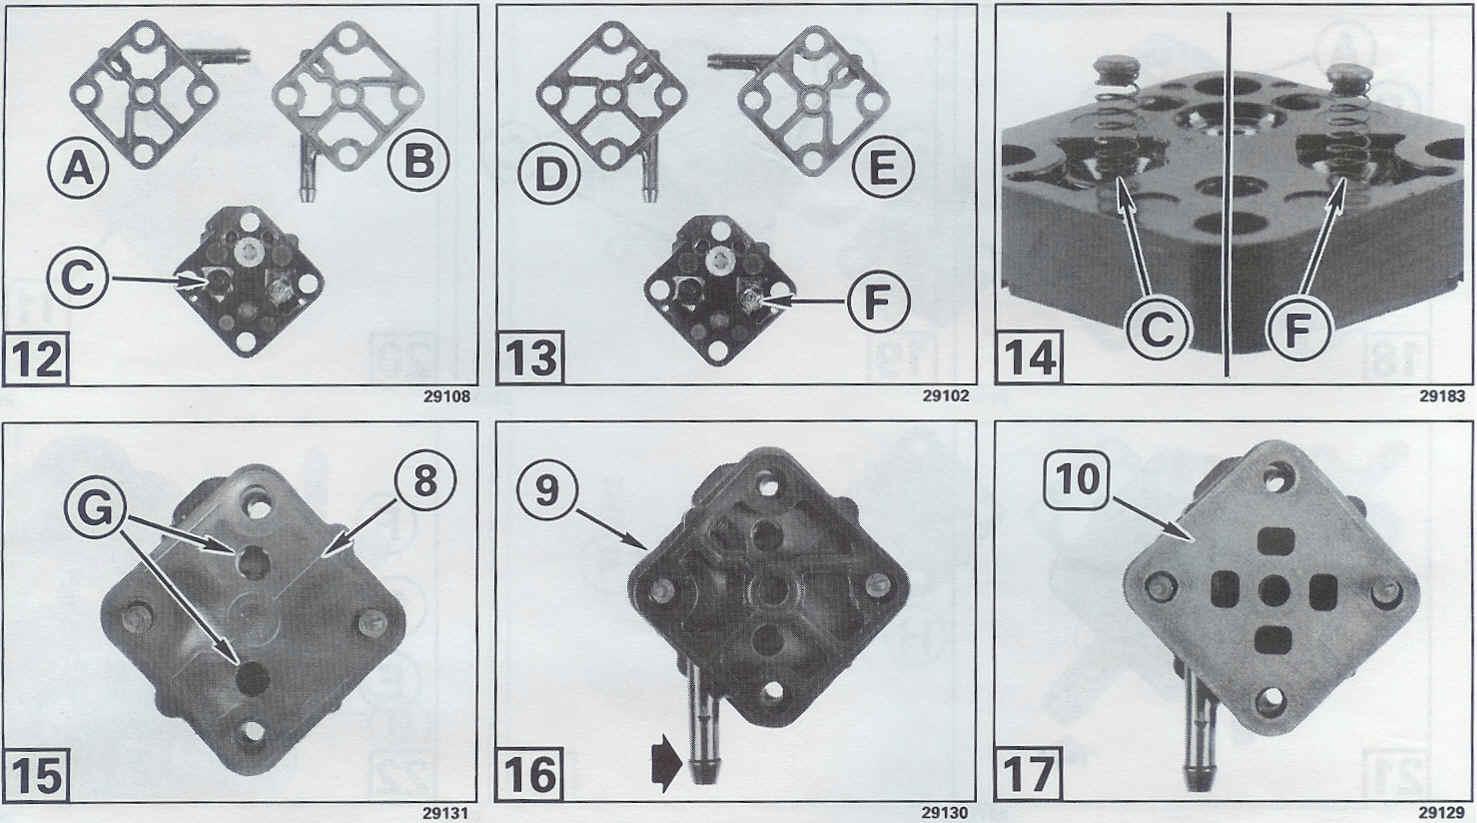 Johnson 9.9 Fuel Pump Diagram - Go Wiring Diagram - Wiring Diagram For Mercury Outboard Motor